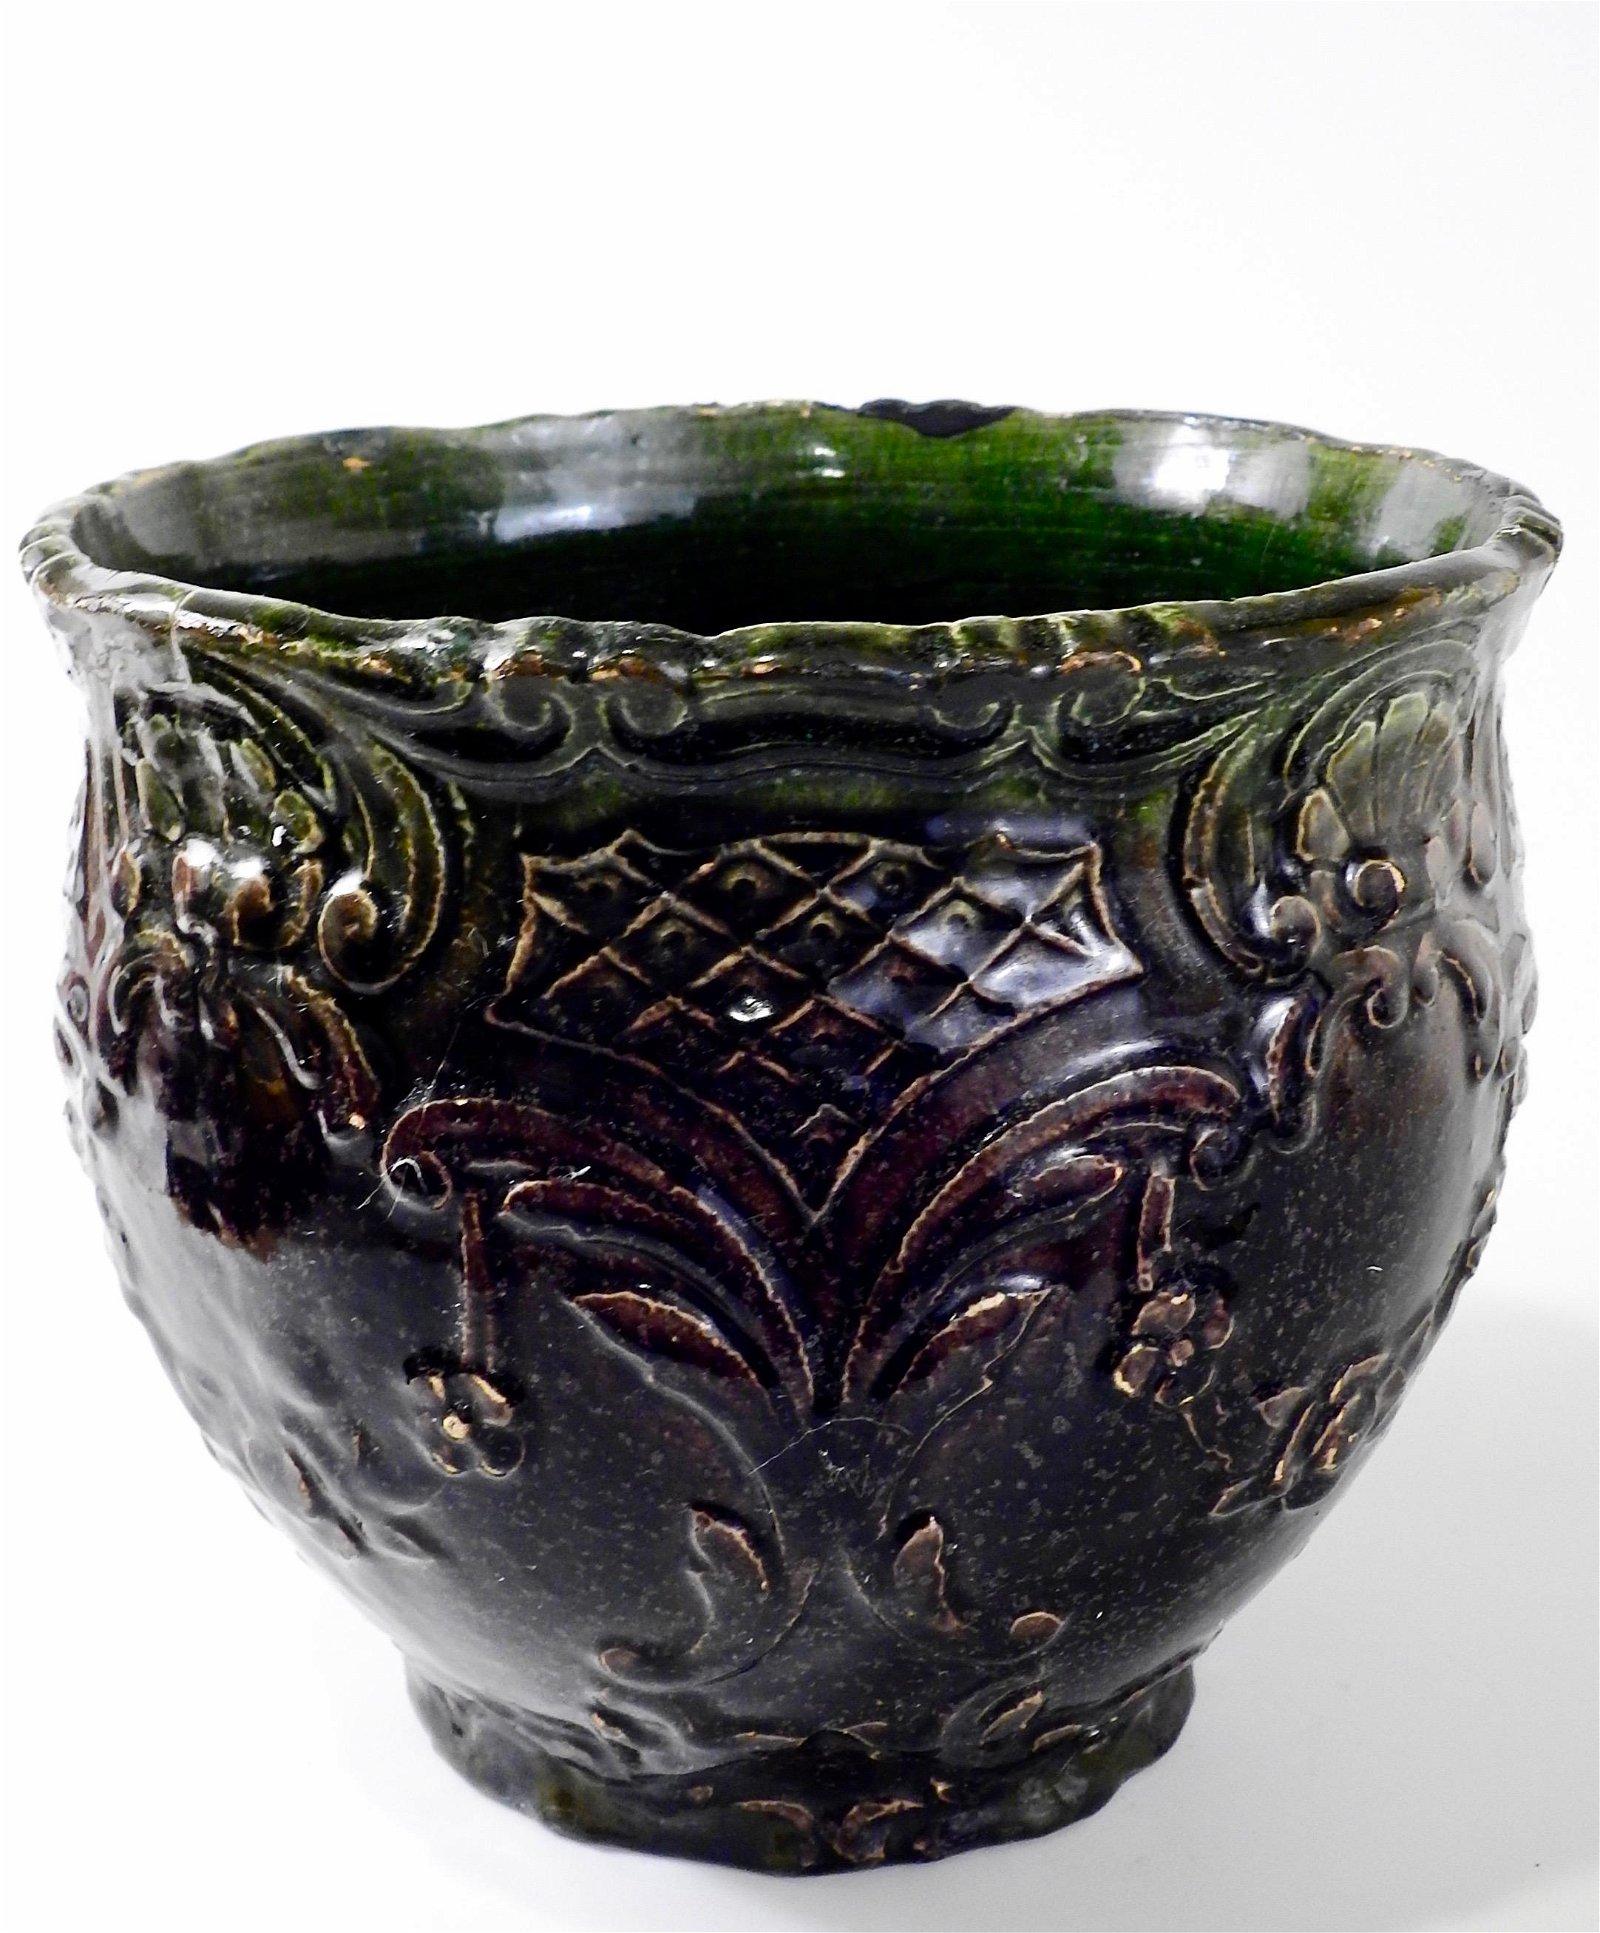 Antique Victorian Majolica Pottery Planter Cachepot